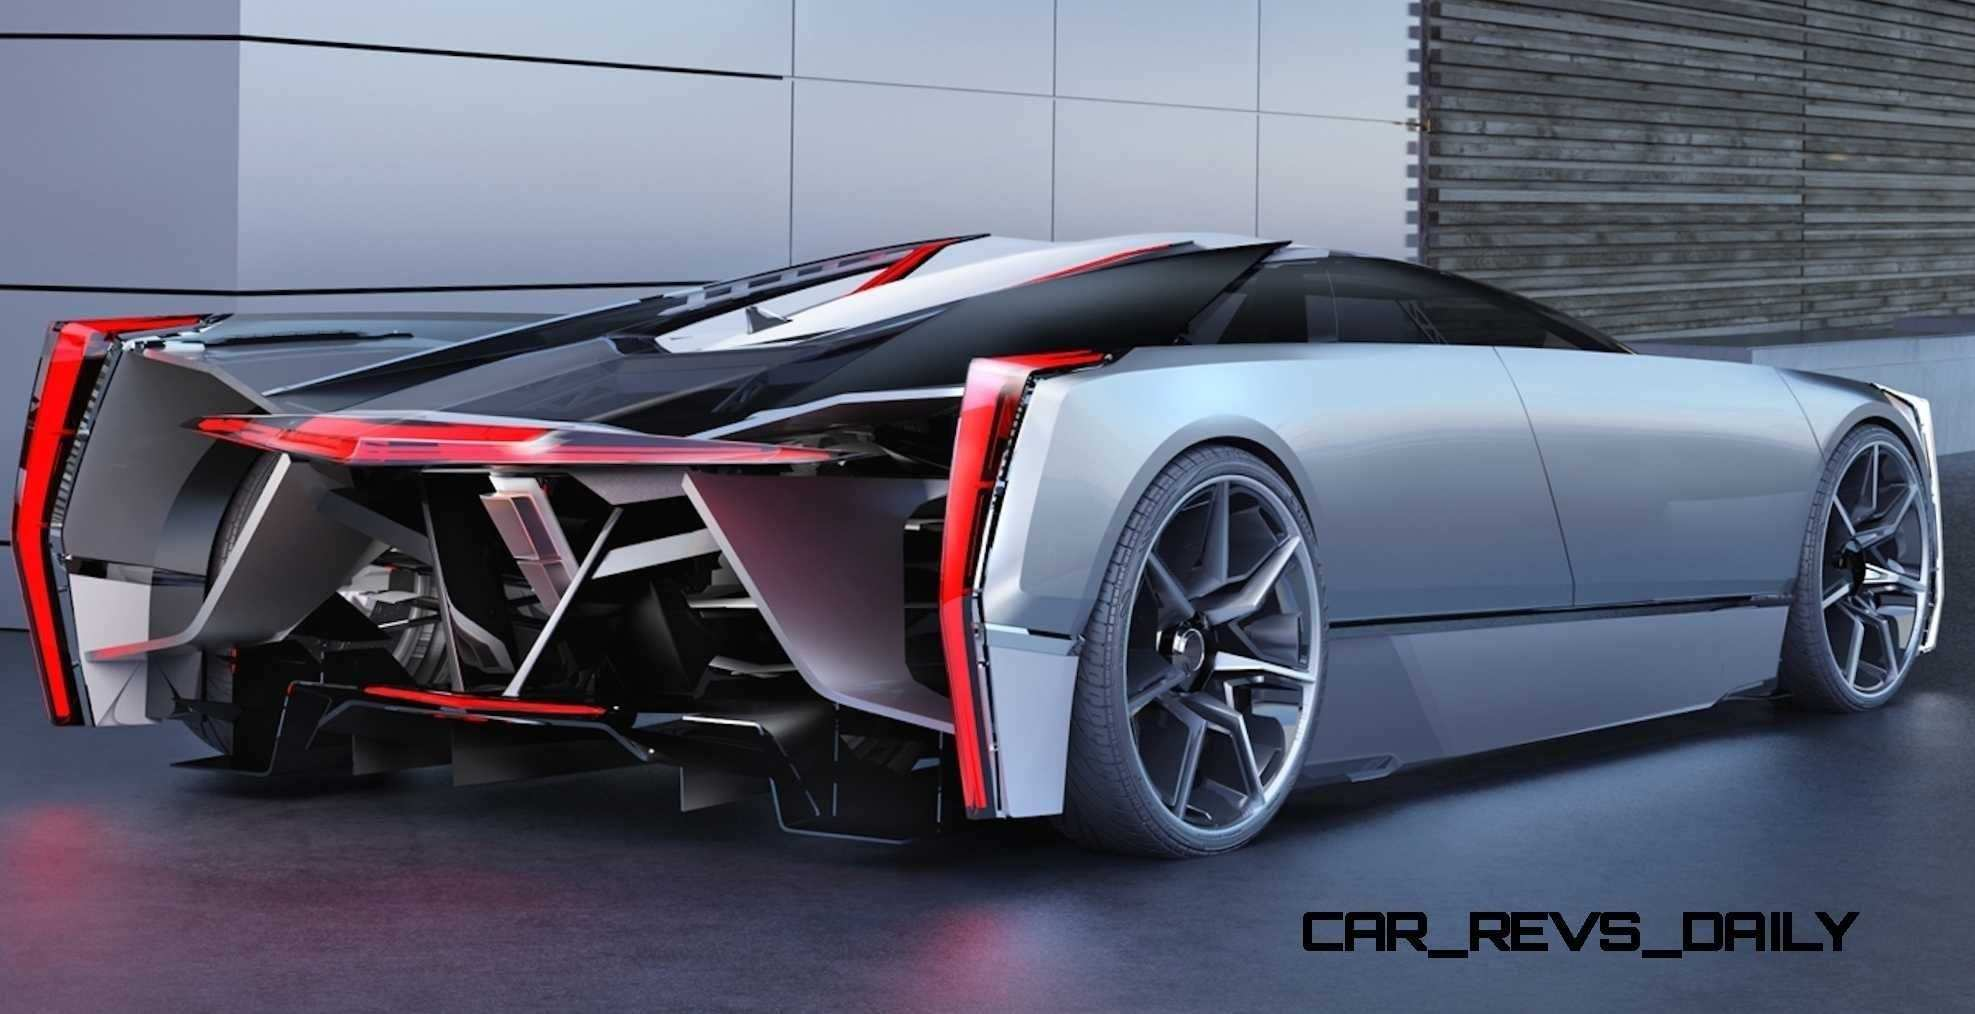 30 Best Review 2020 Cadillac Ciana Rumors for 2020 Cadillac Ciana